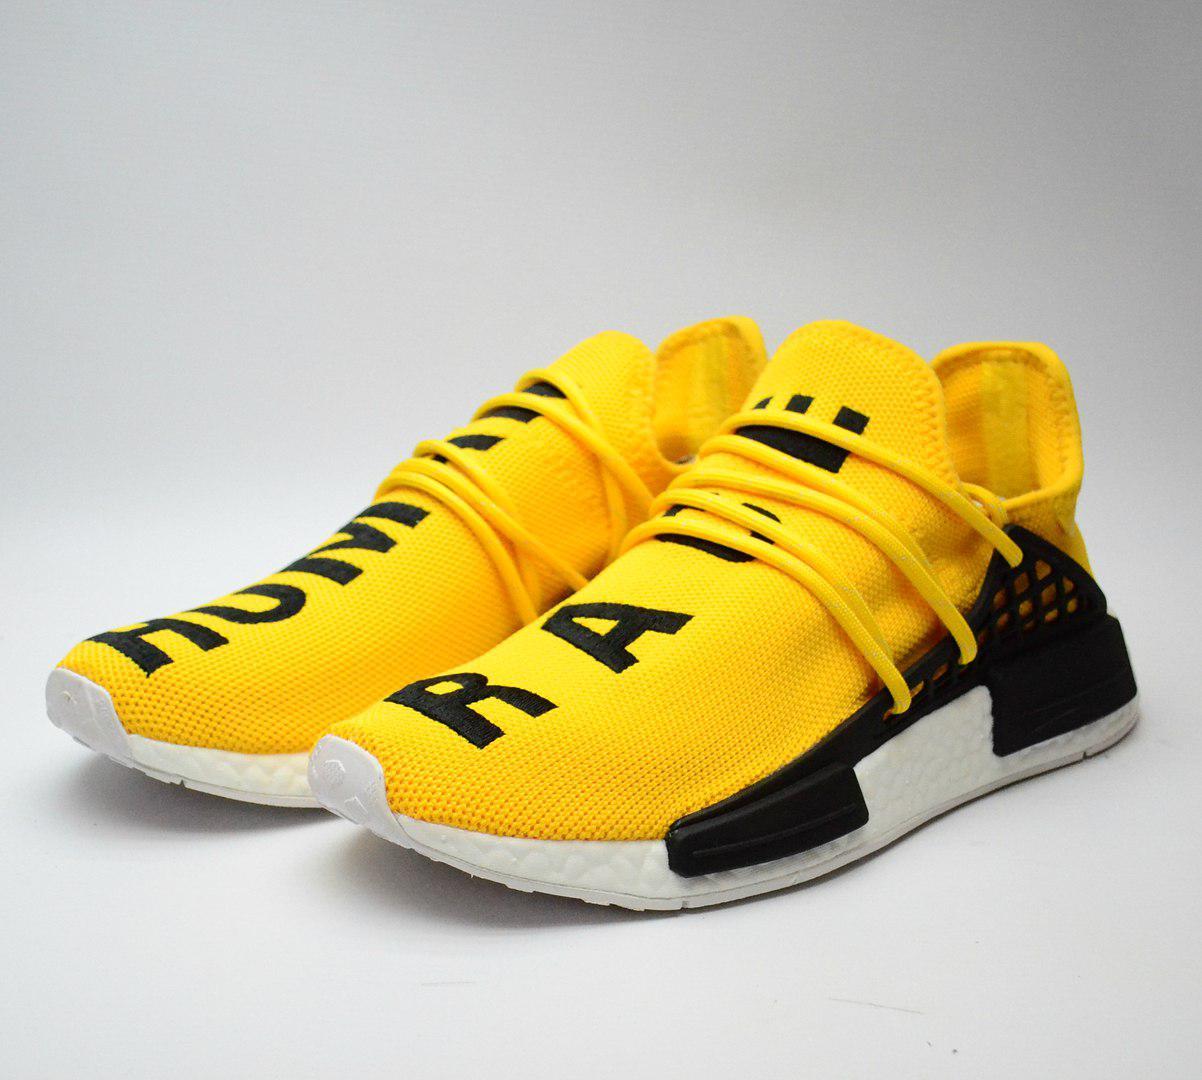 0040b74b808304 Мужские Кроссовки Adidas originals ×pharrell williams nmd Human Race yellow  (копия) - Интернет